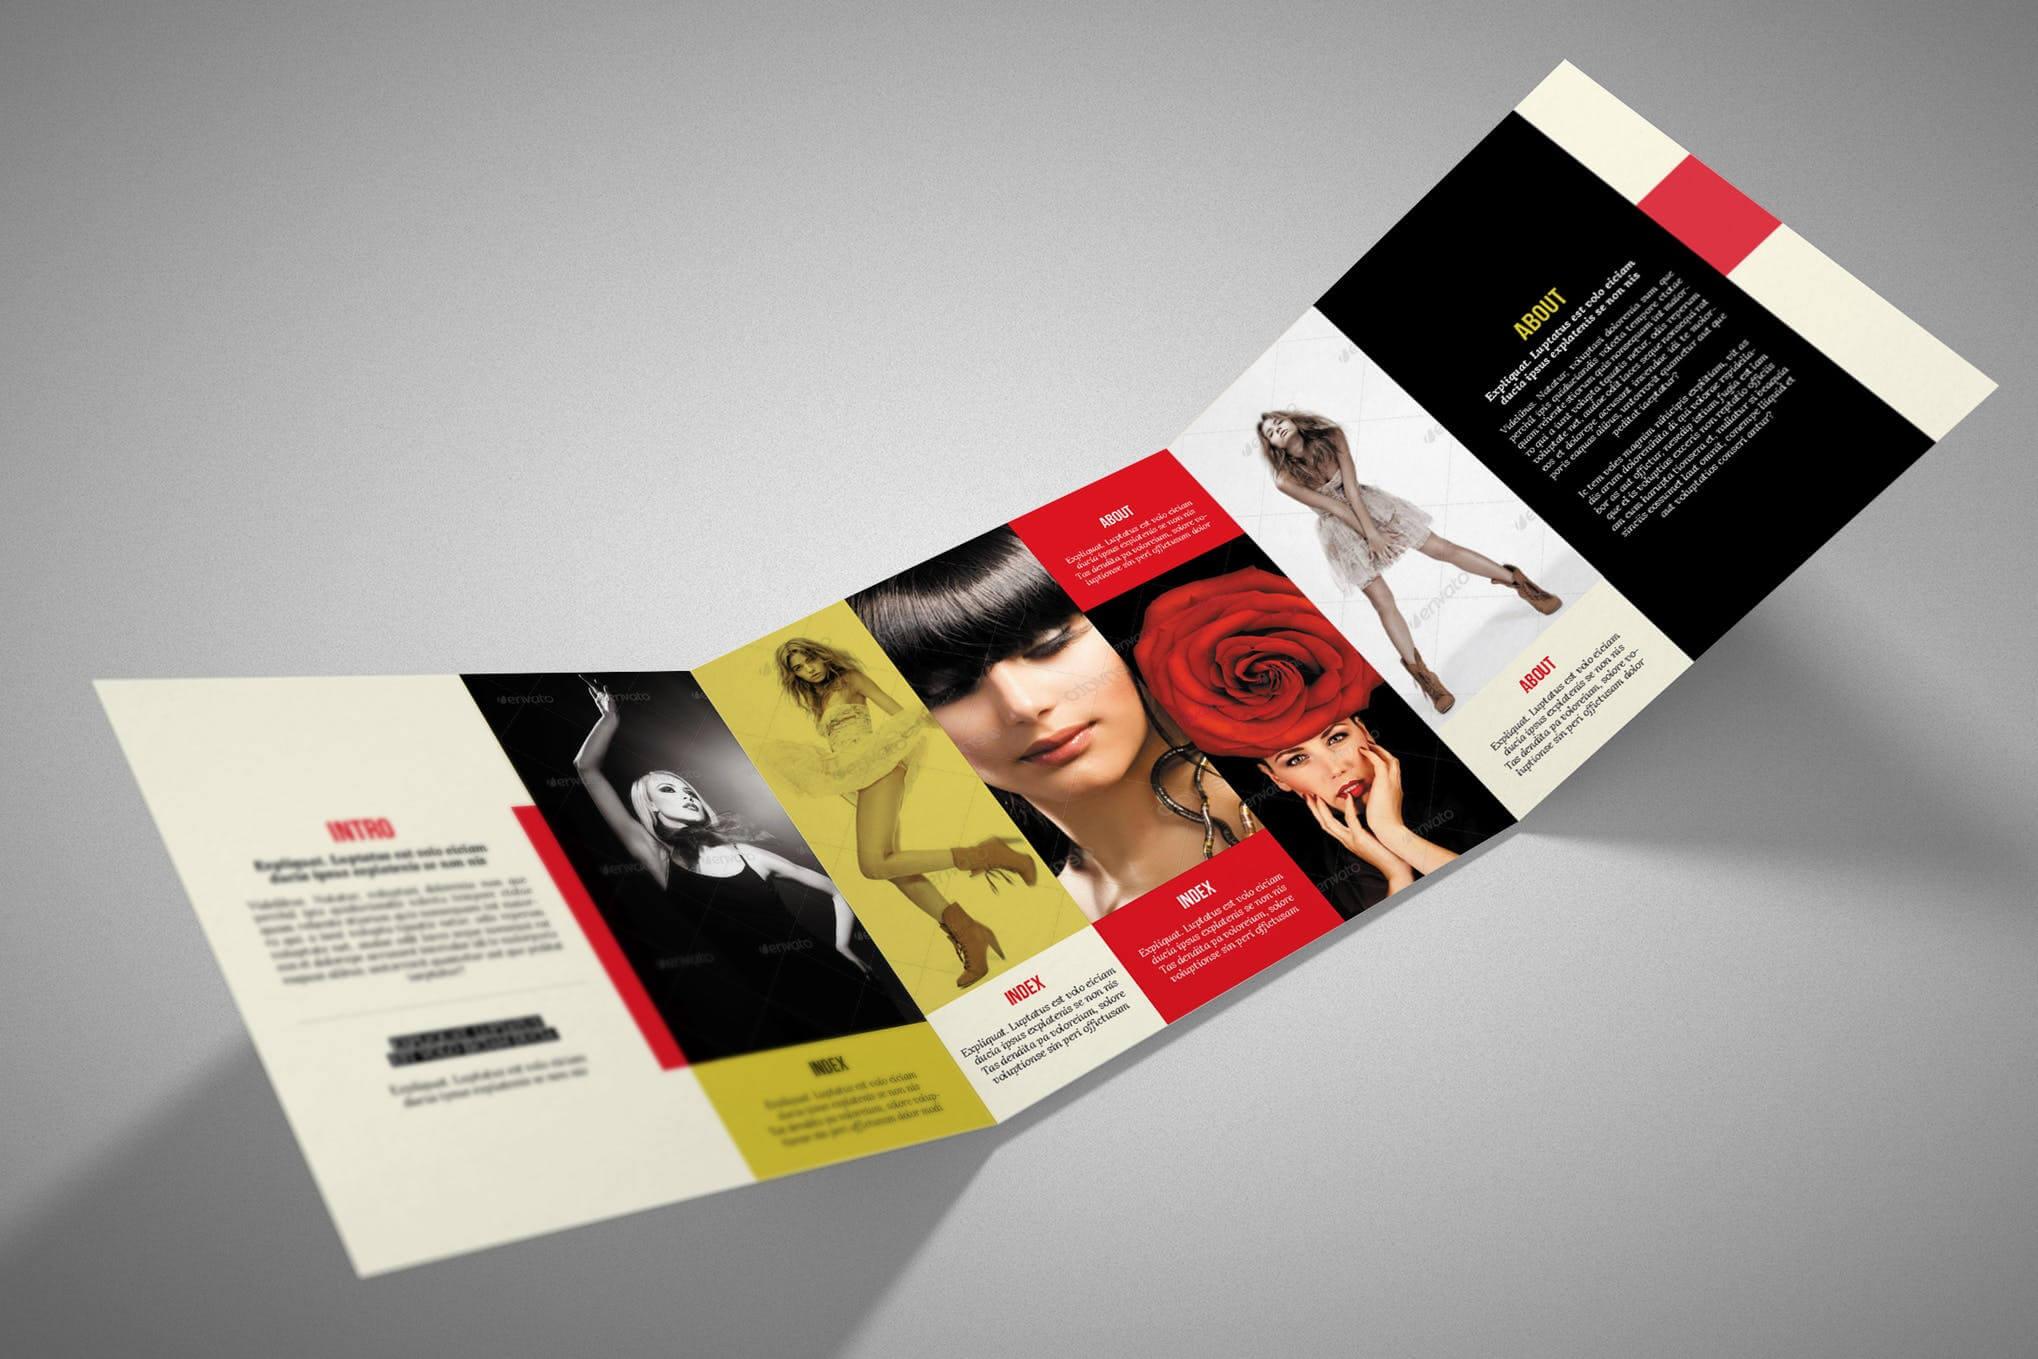 009 Adobe Indesign Tri Fold Brochure Template Ideas Trifold Intended For Adobe Indesign Tri Fold Brochure Template